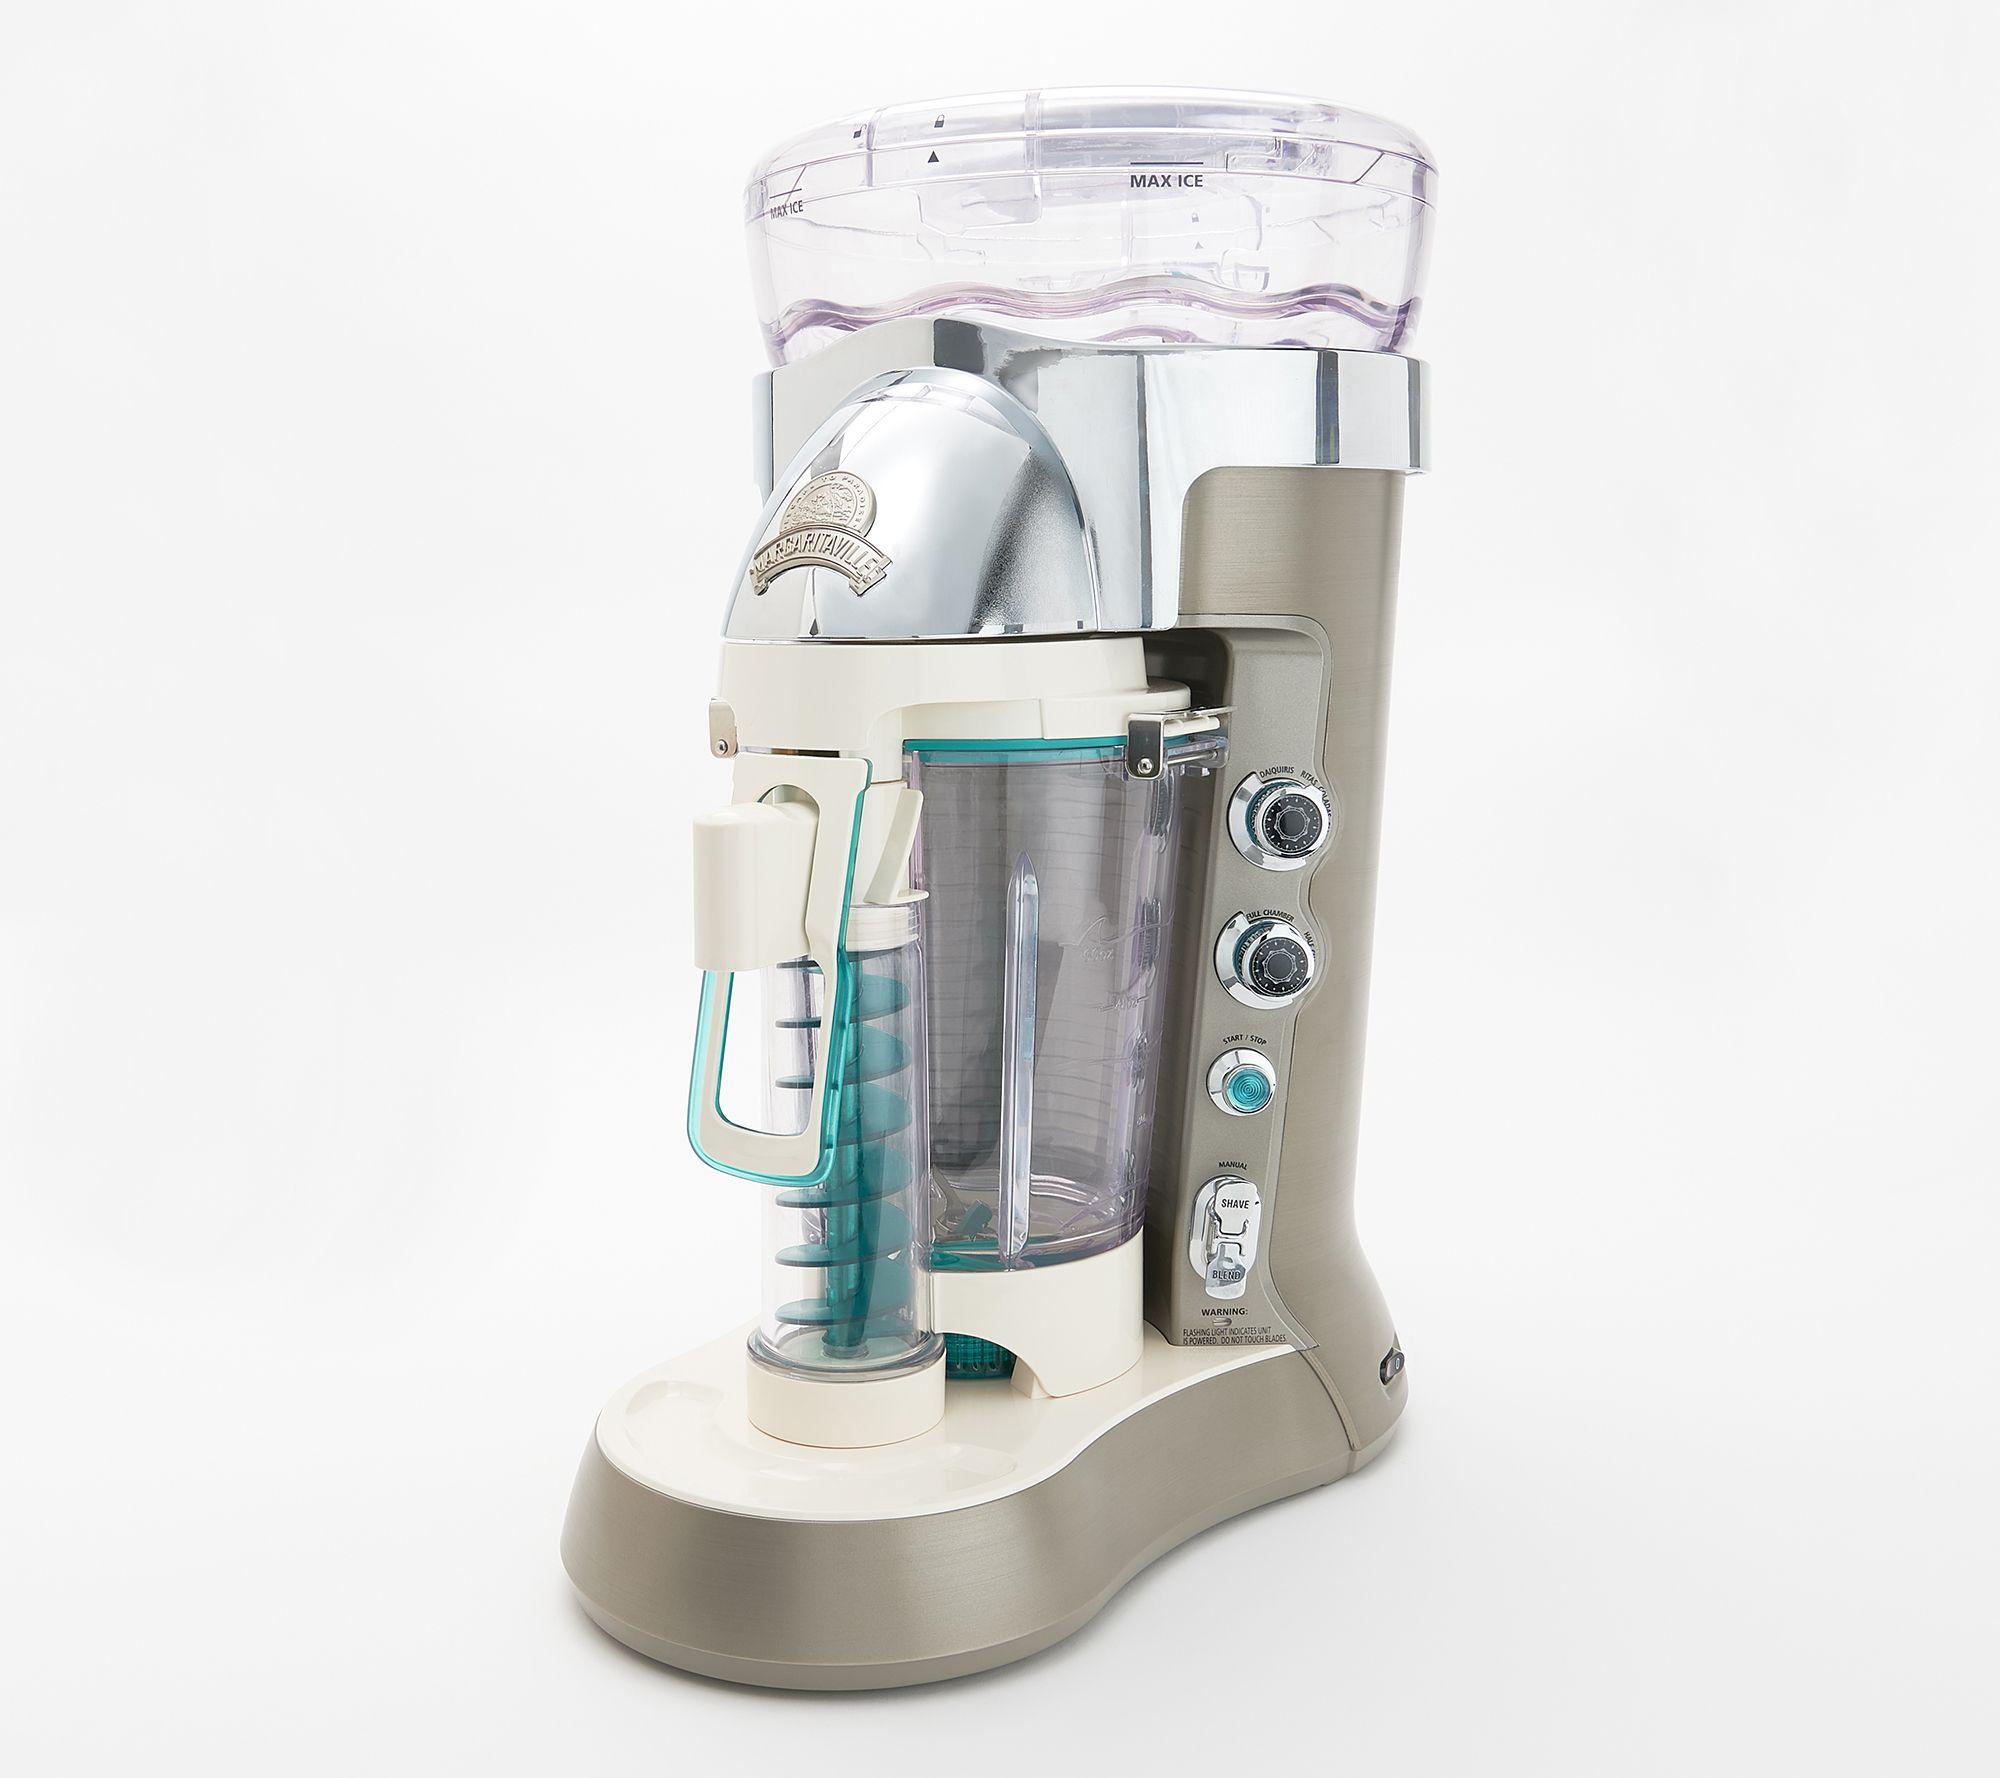 Margaritaville Bali Frozen Concoction Maker with Self Dispenser — QVC com